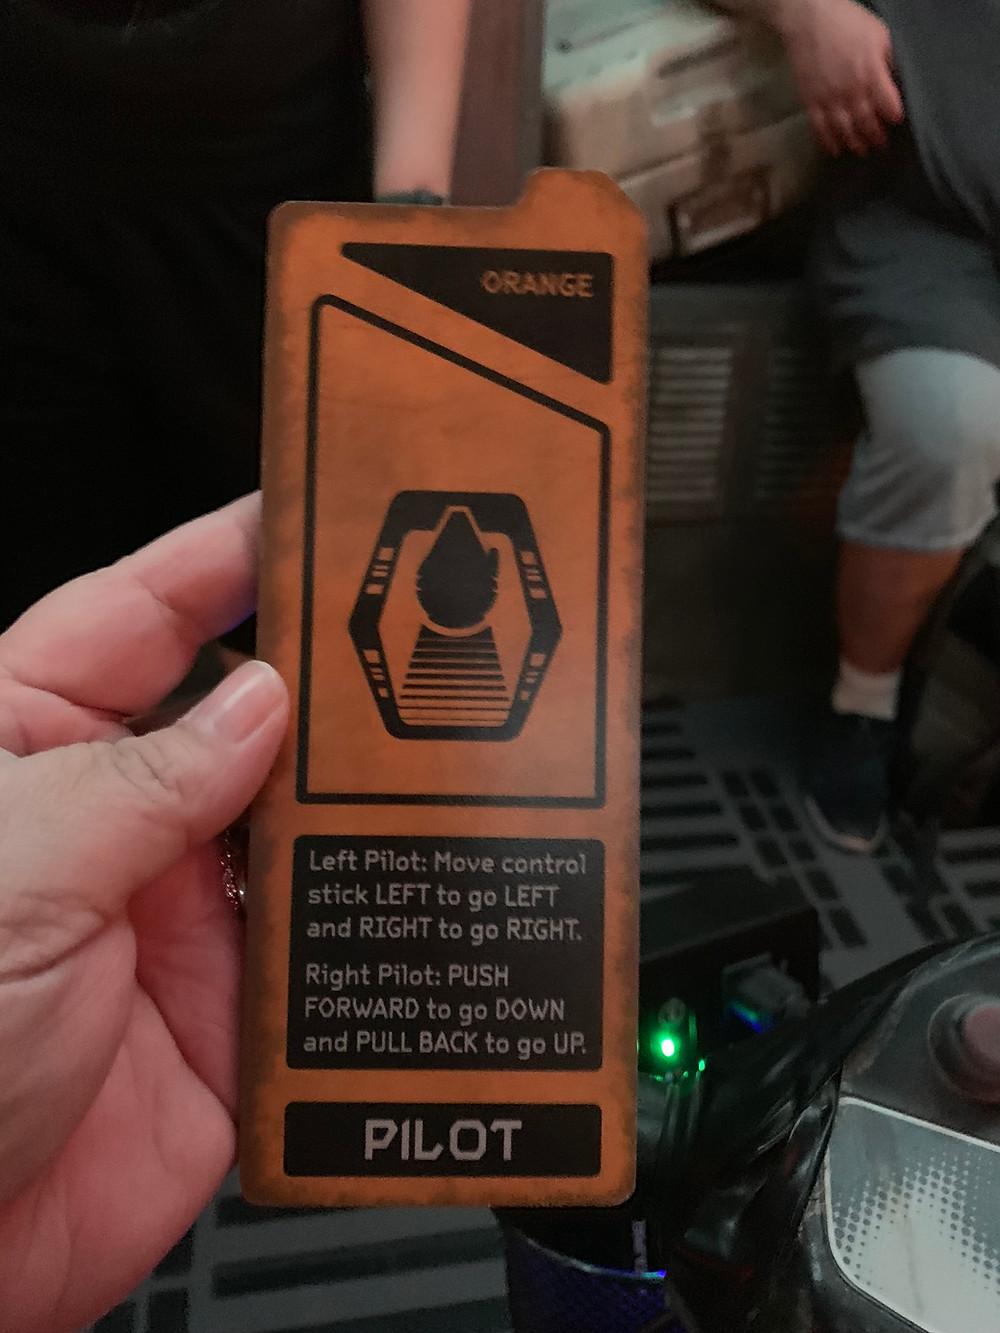 Disabled Disney Orange and black card describing Pilot job